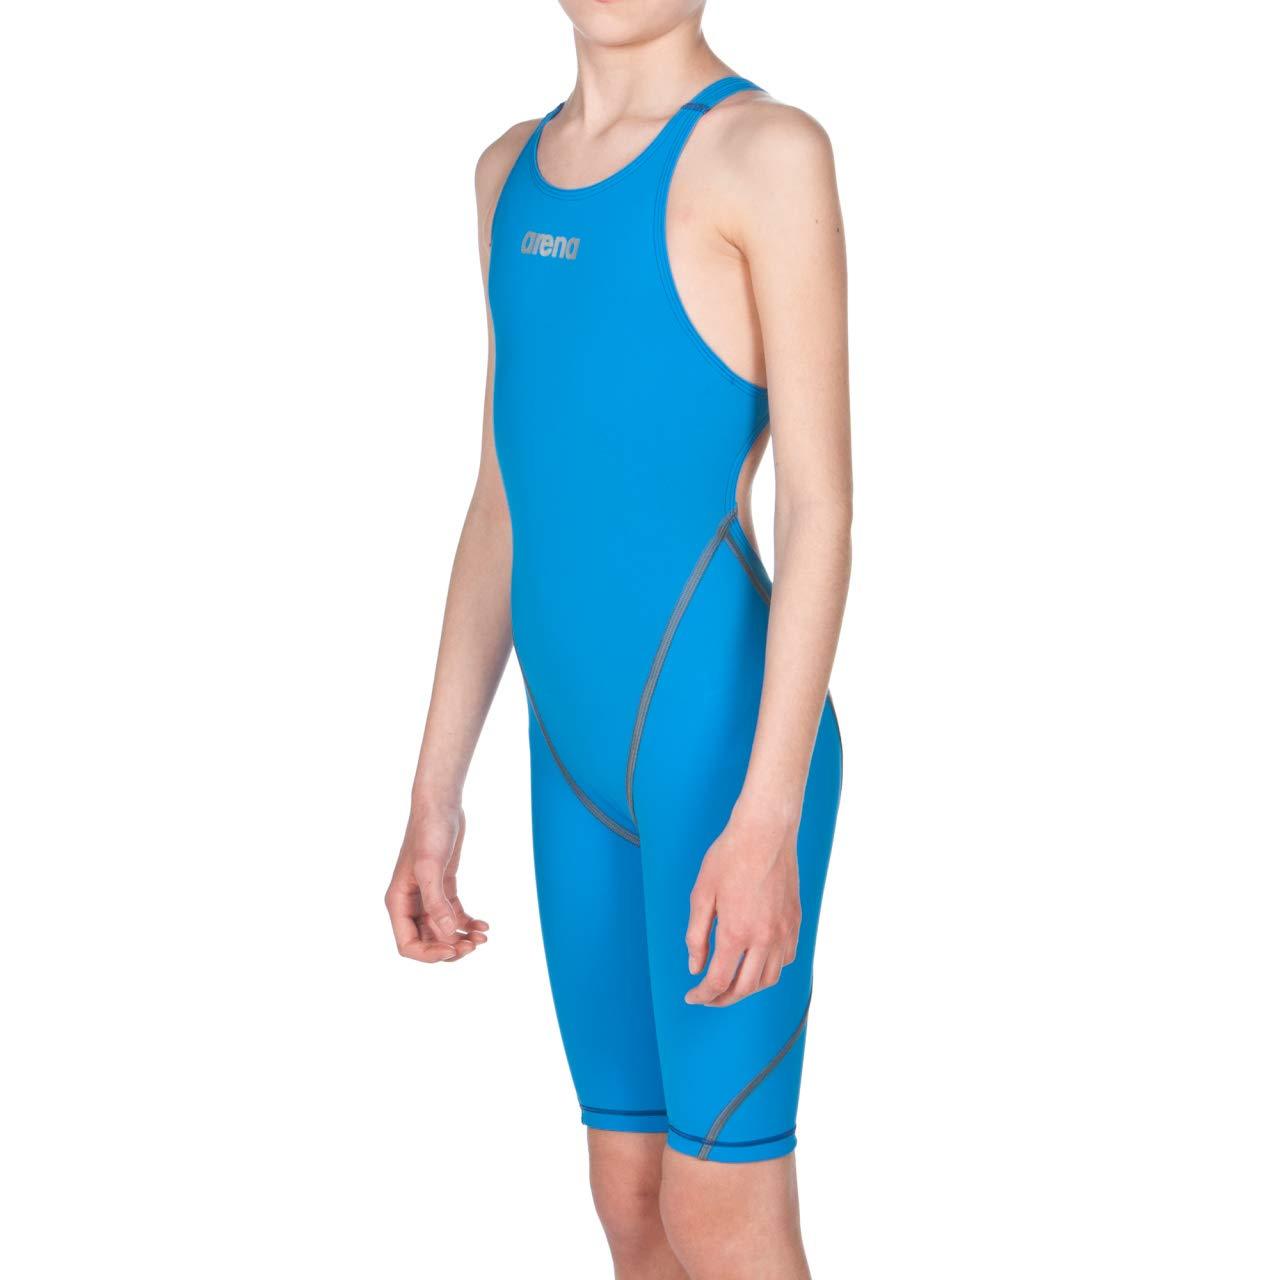 Costume da Bagno Bambina G Powerskin St 2.0 Le Open Back Racesuit ARENA